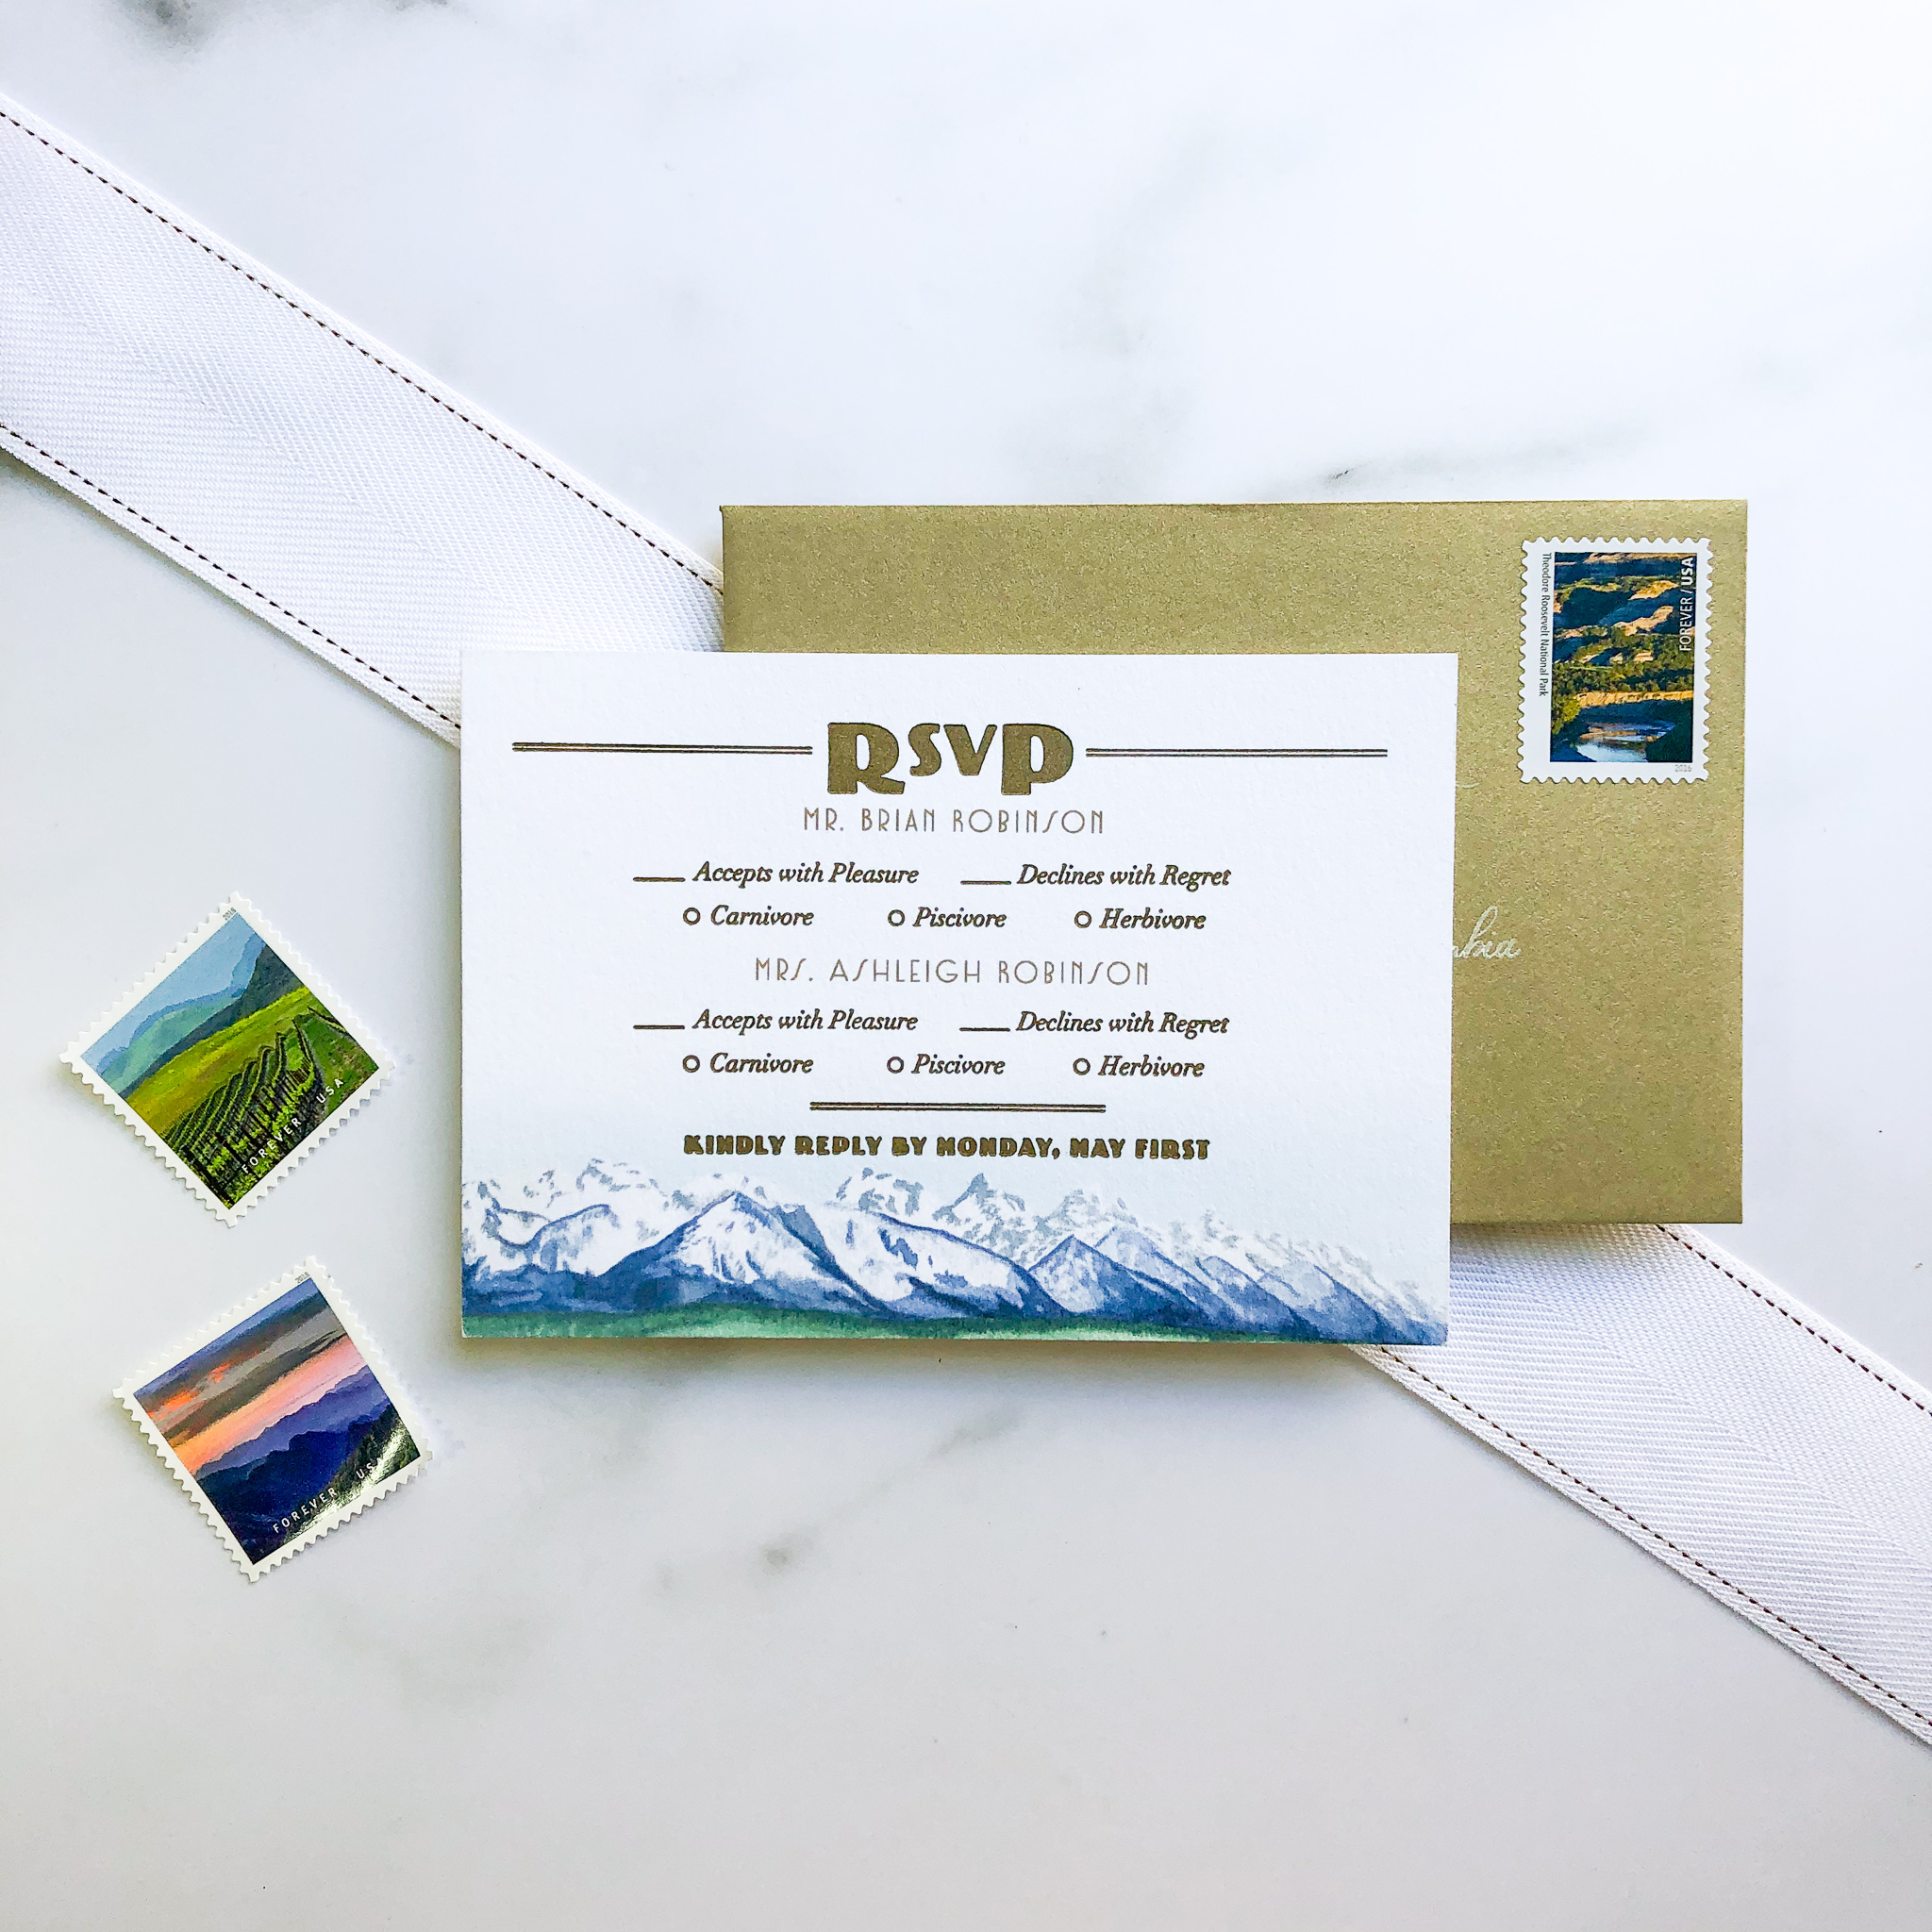 TypeA_NationalParkWedding_GoldAndWhite_RSVPcard_ModernArtDeco.jpg